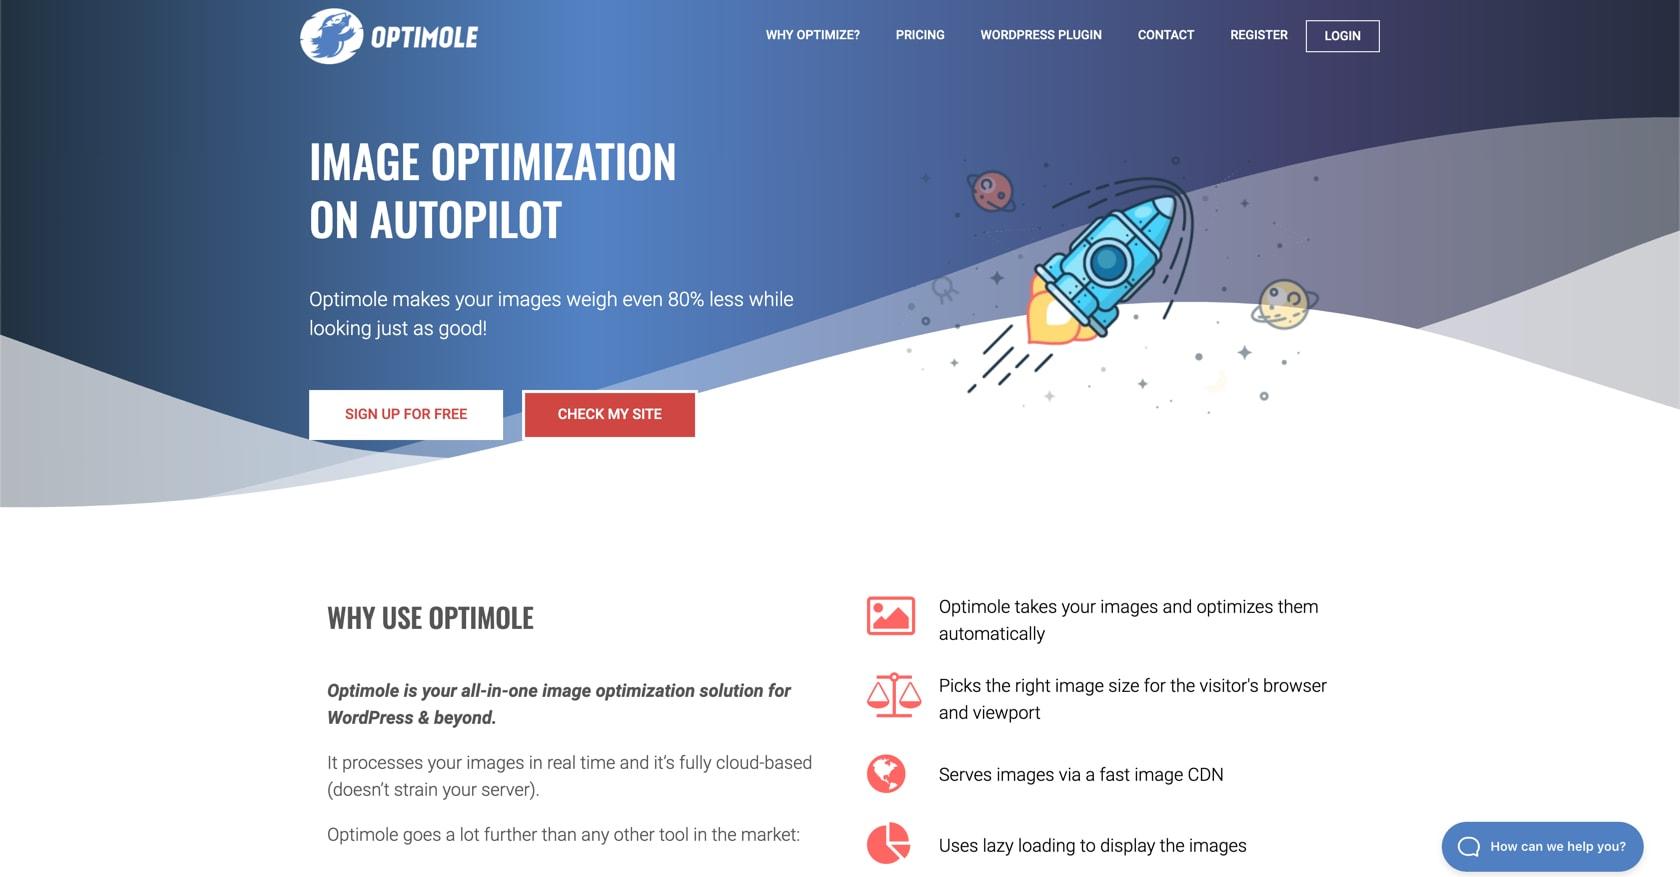 Optimole Review - A Unique Image Optimization Service & CDN For WordPress